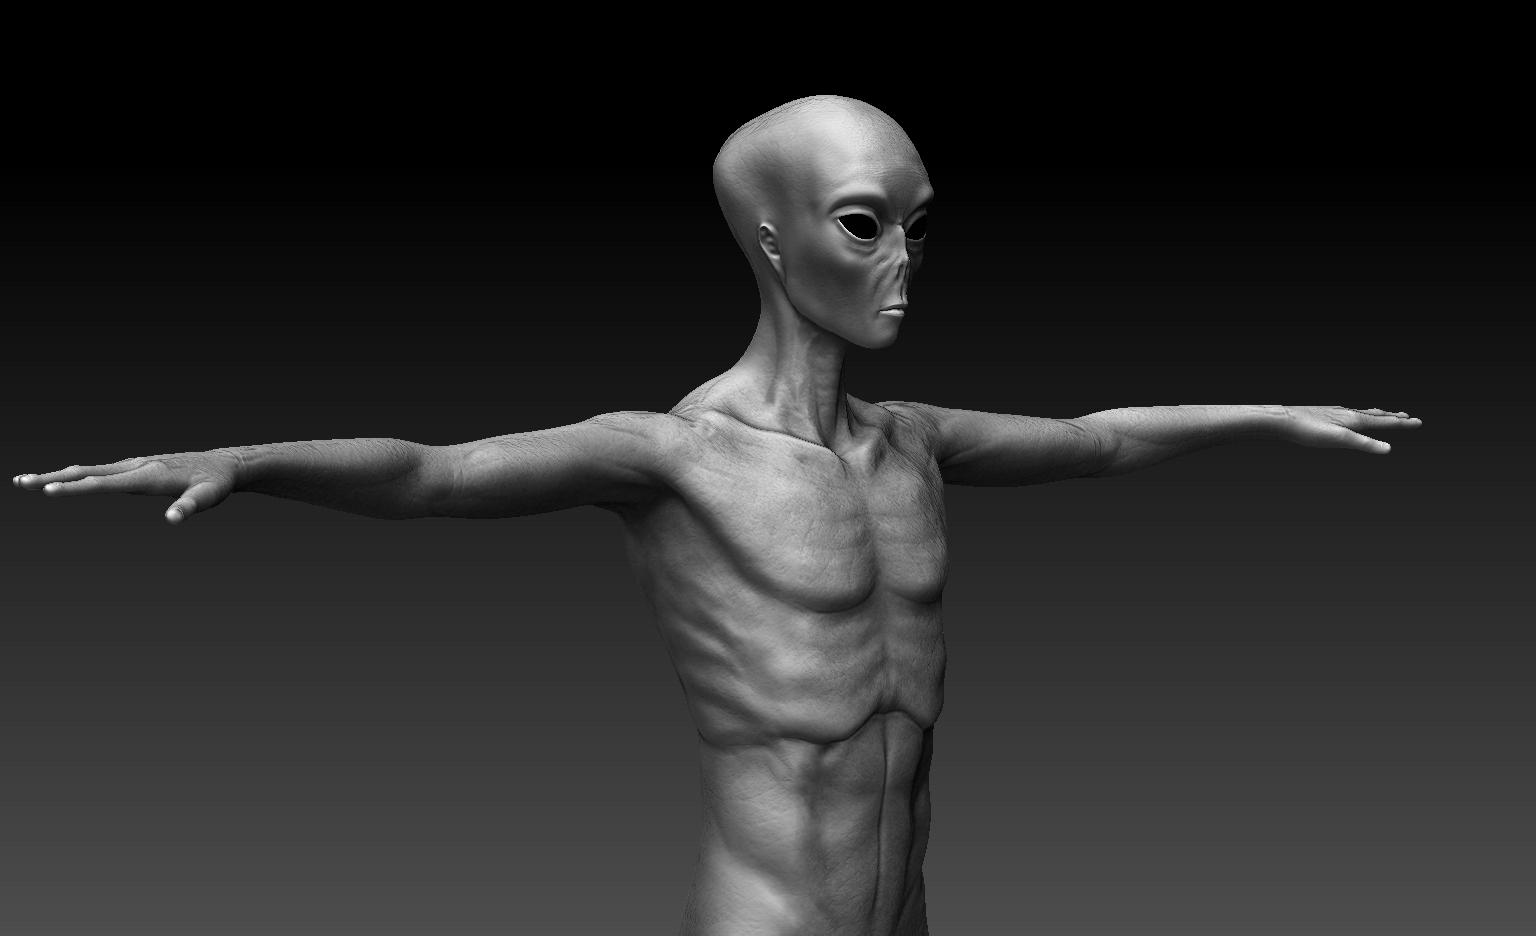 user_img-4QQjp8Ff1g_Alien_02.jpg